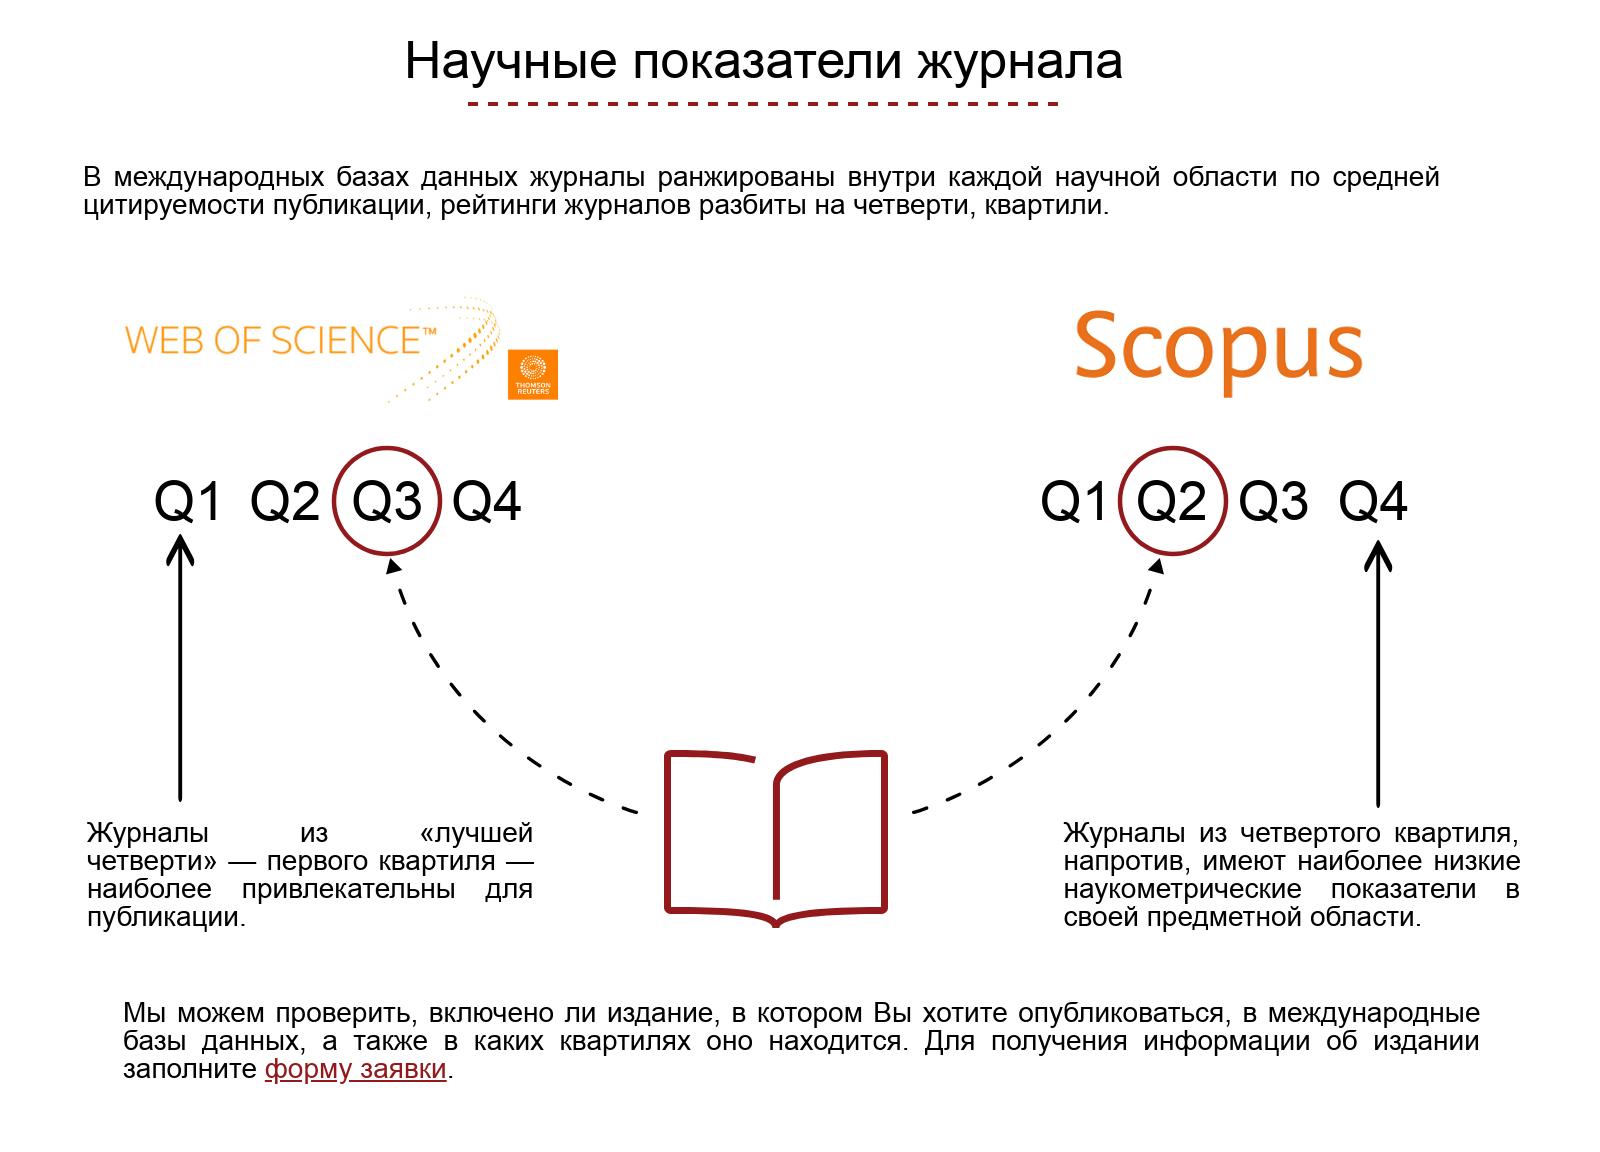 info pokazateli zhurnala